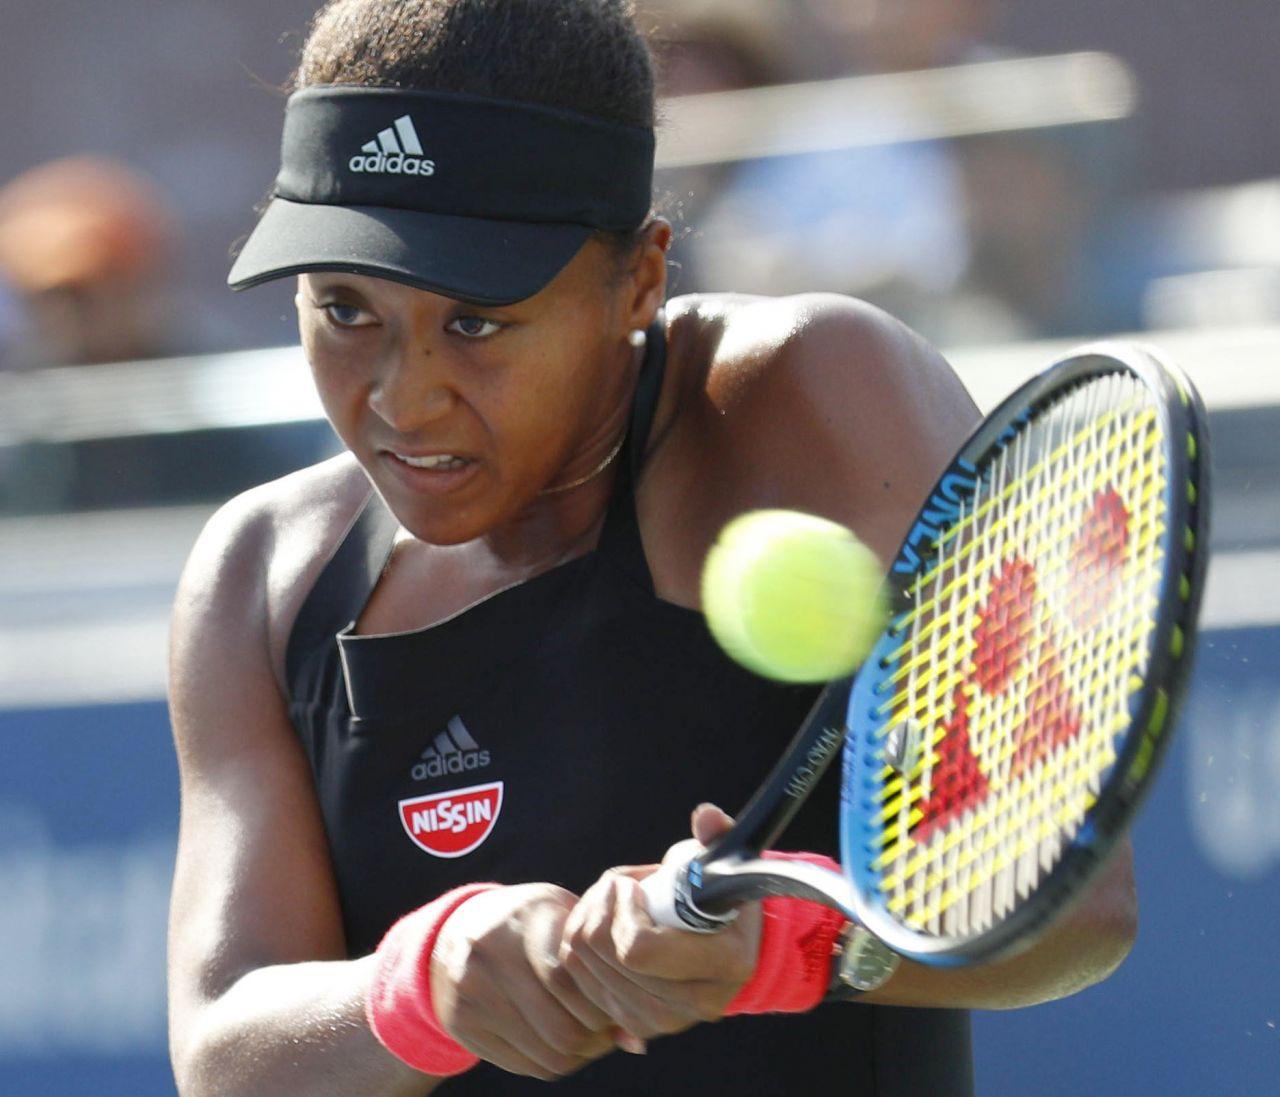 Image Gallery Naomi Duo 2019 07 08: 2018 US Open Tennis Tournament 09/01/2018